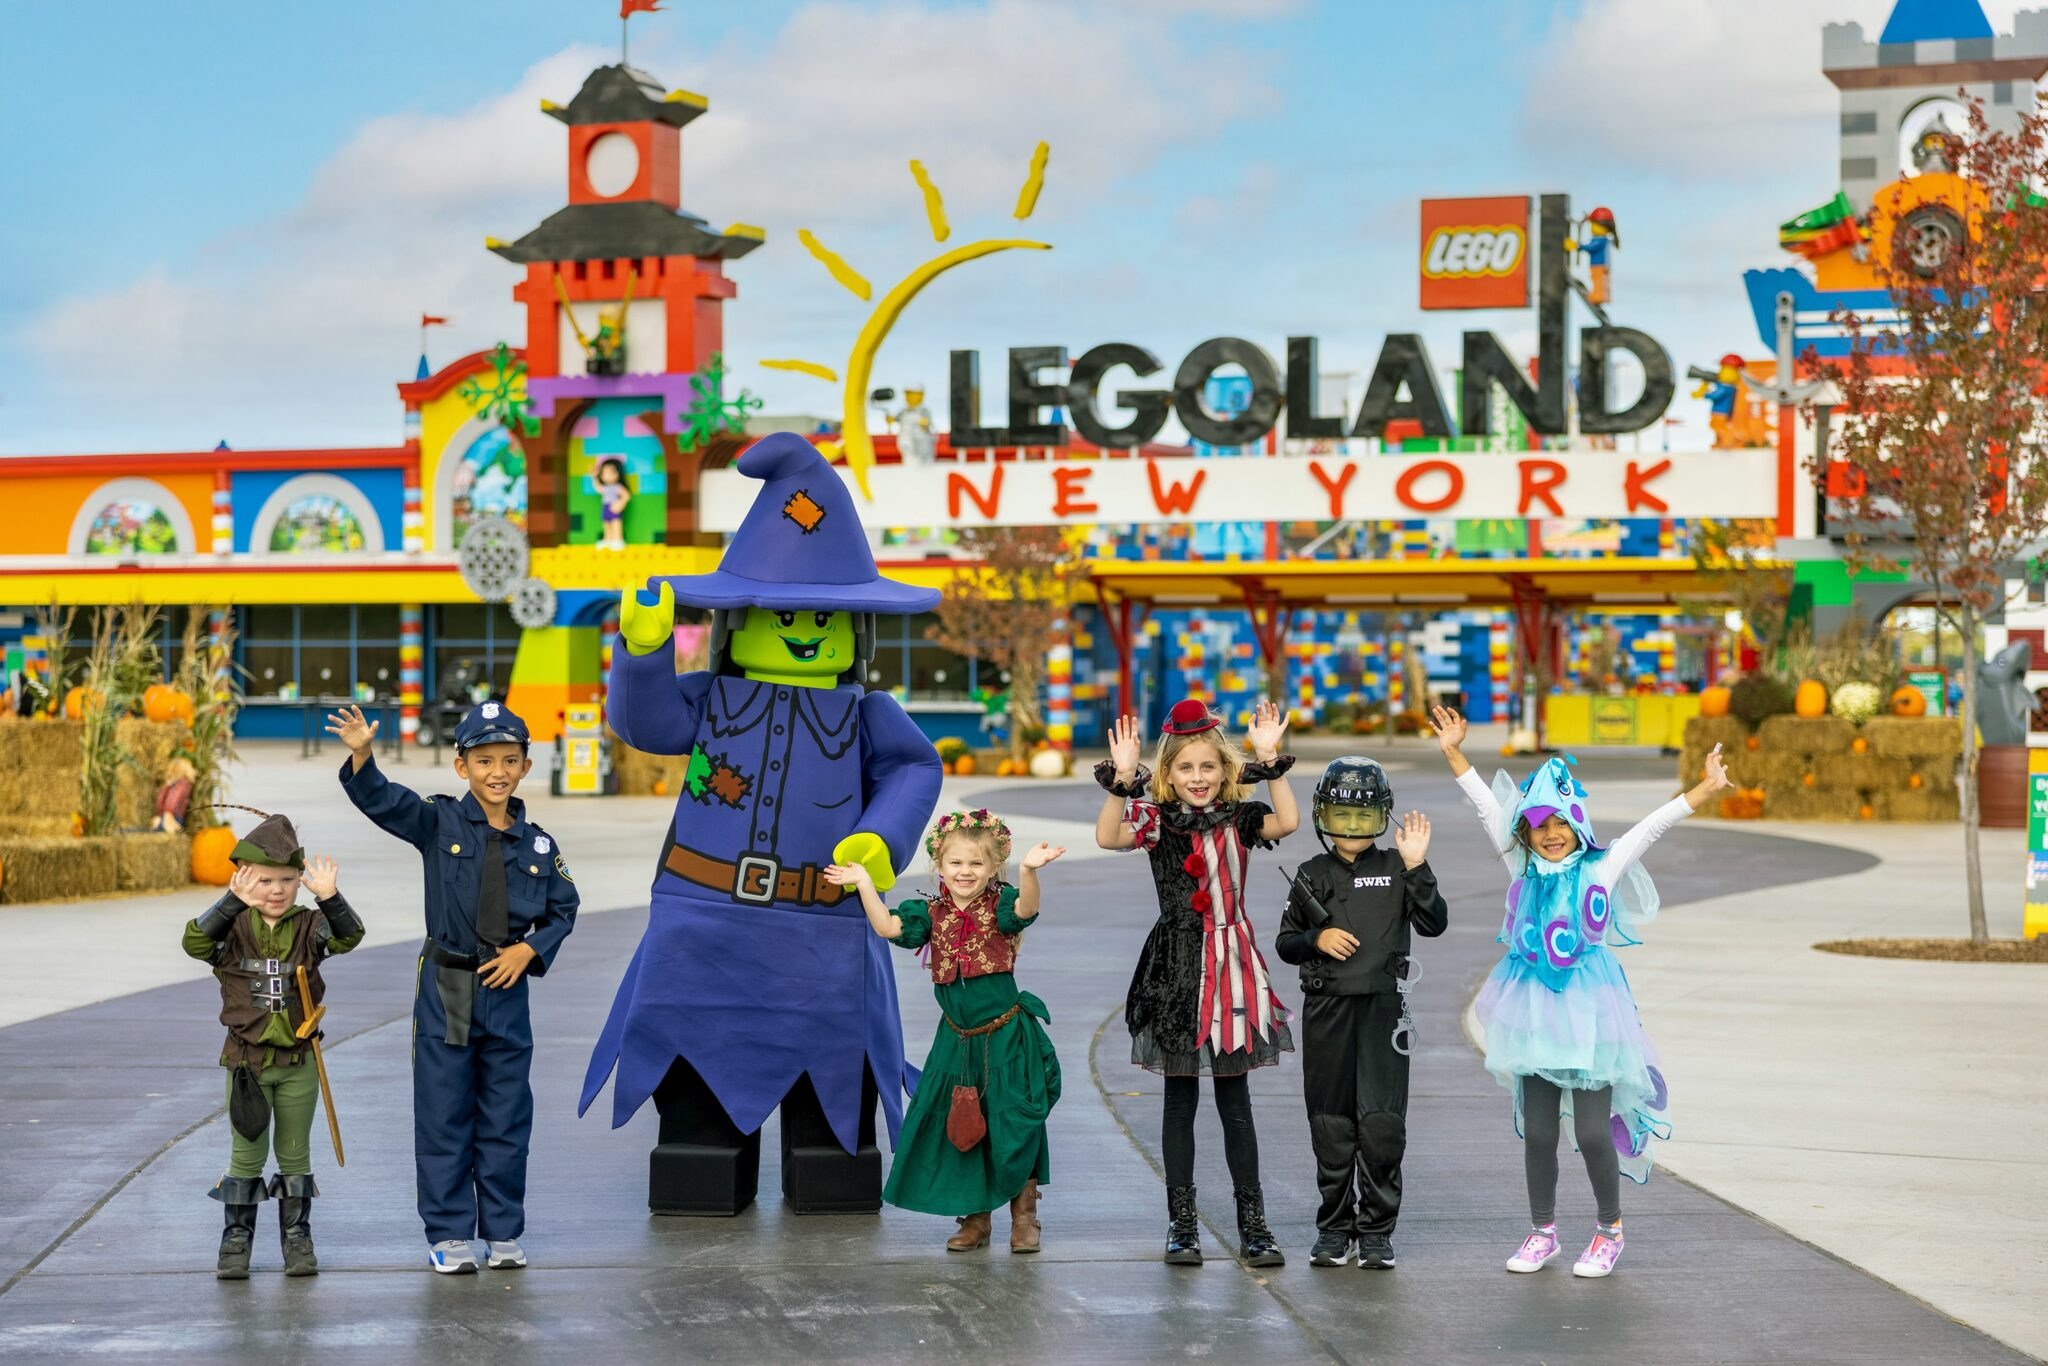 Legoland New York Resort Brick-Or-Treat